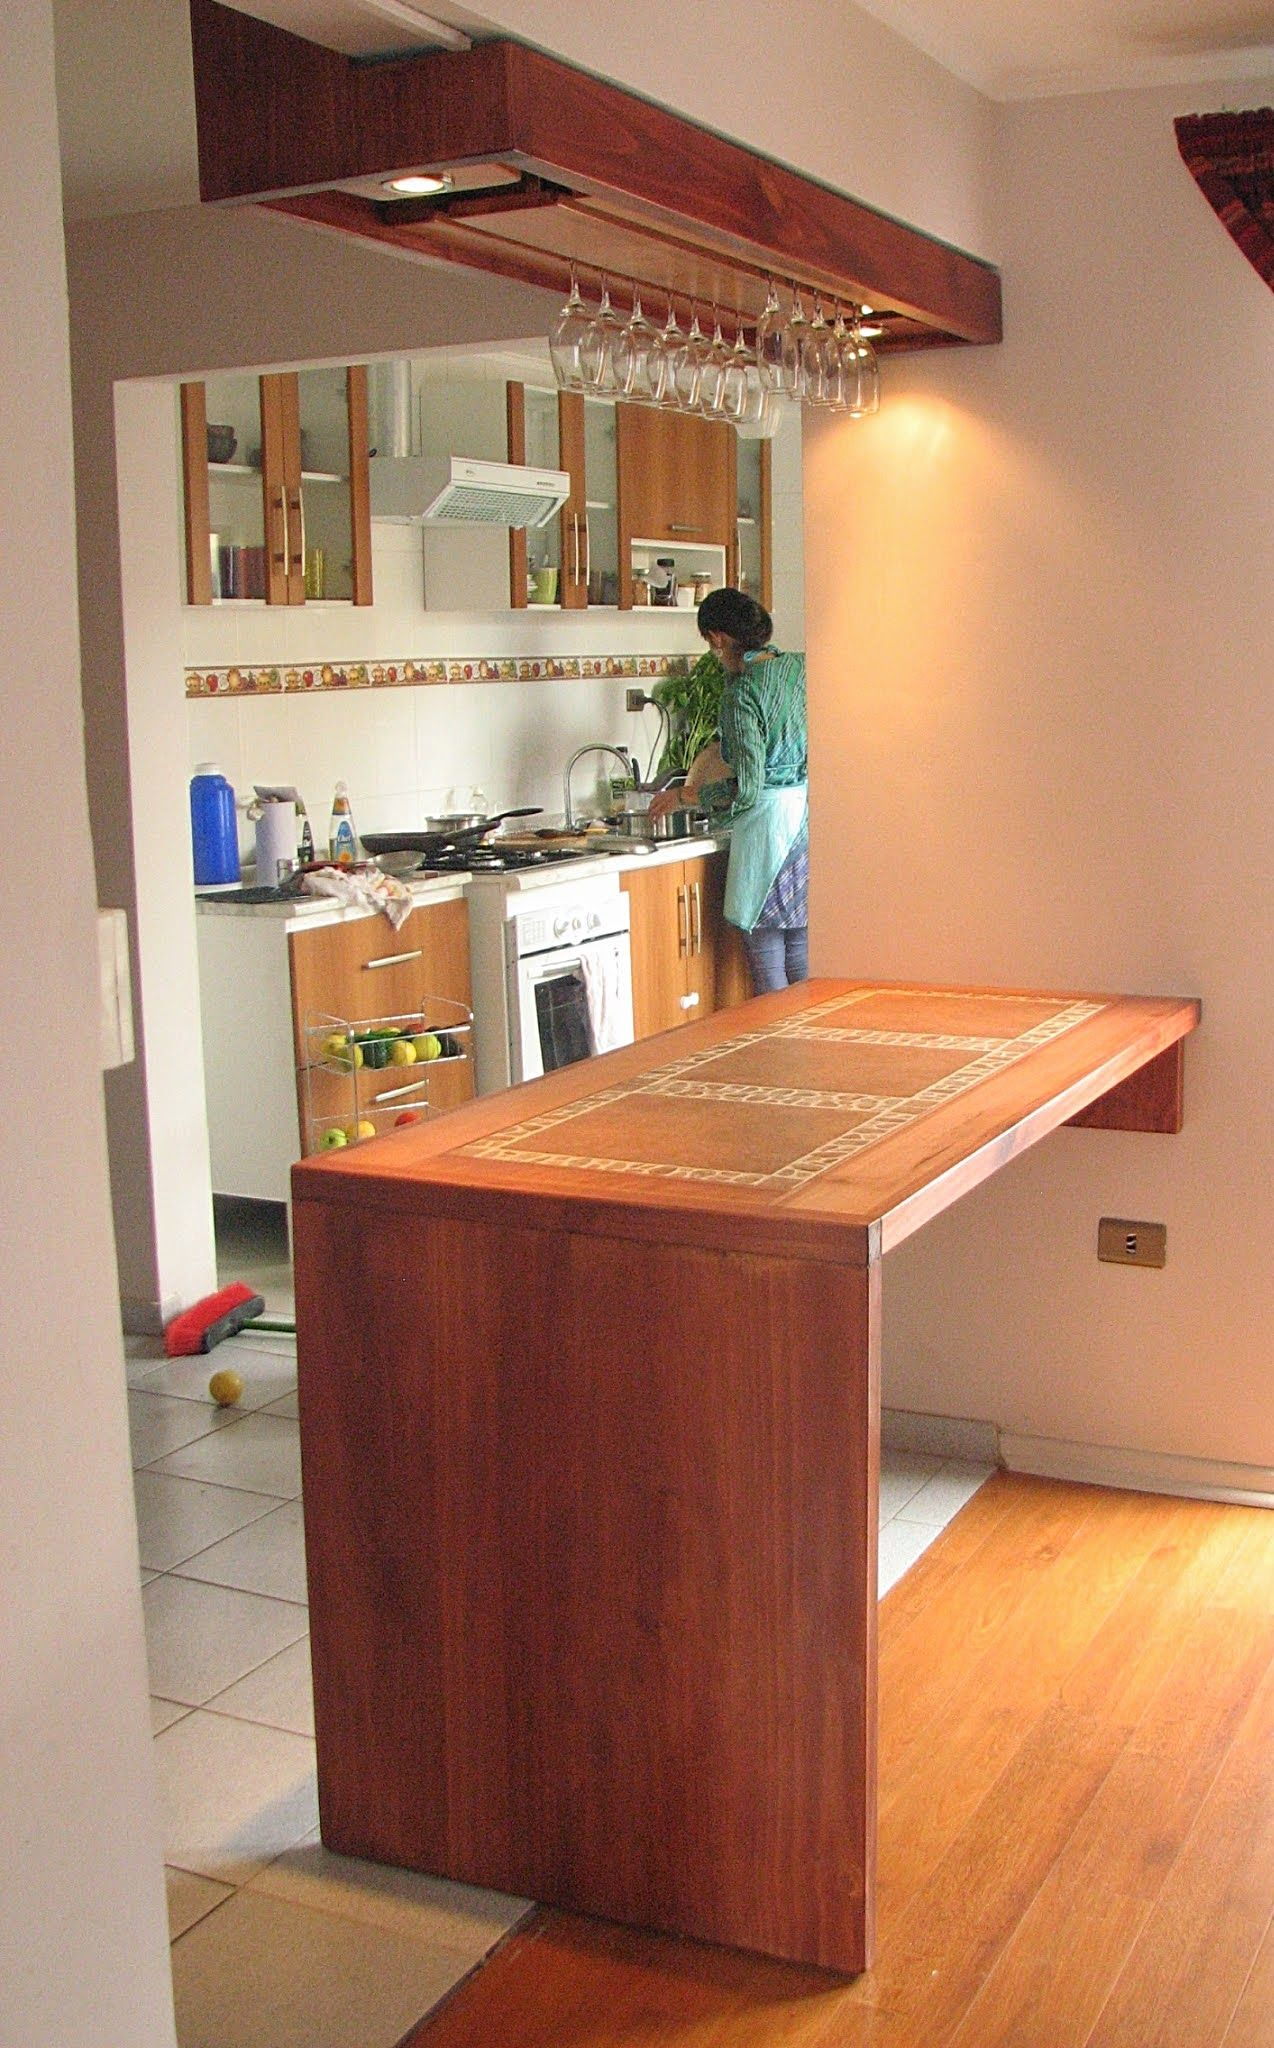 Mobiliario diseñado a medida, construido con madera de pino insigne ...